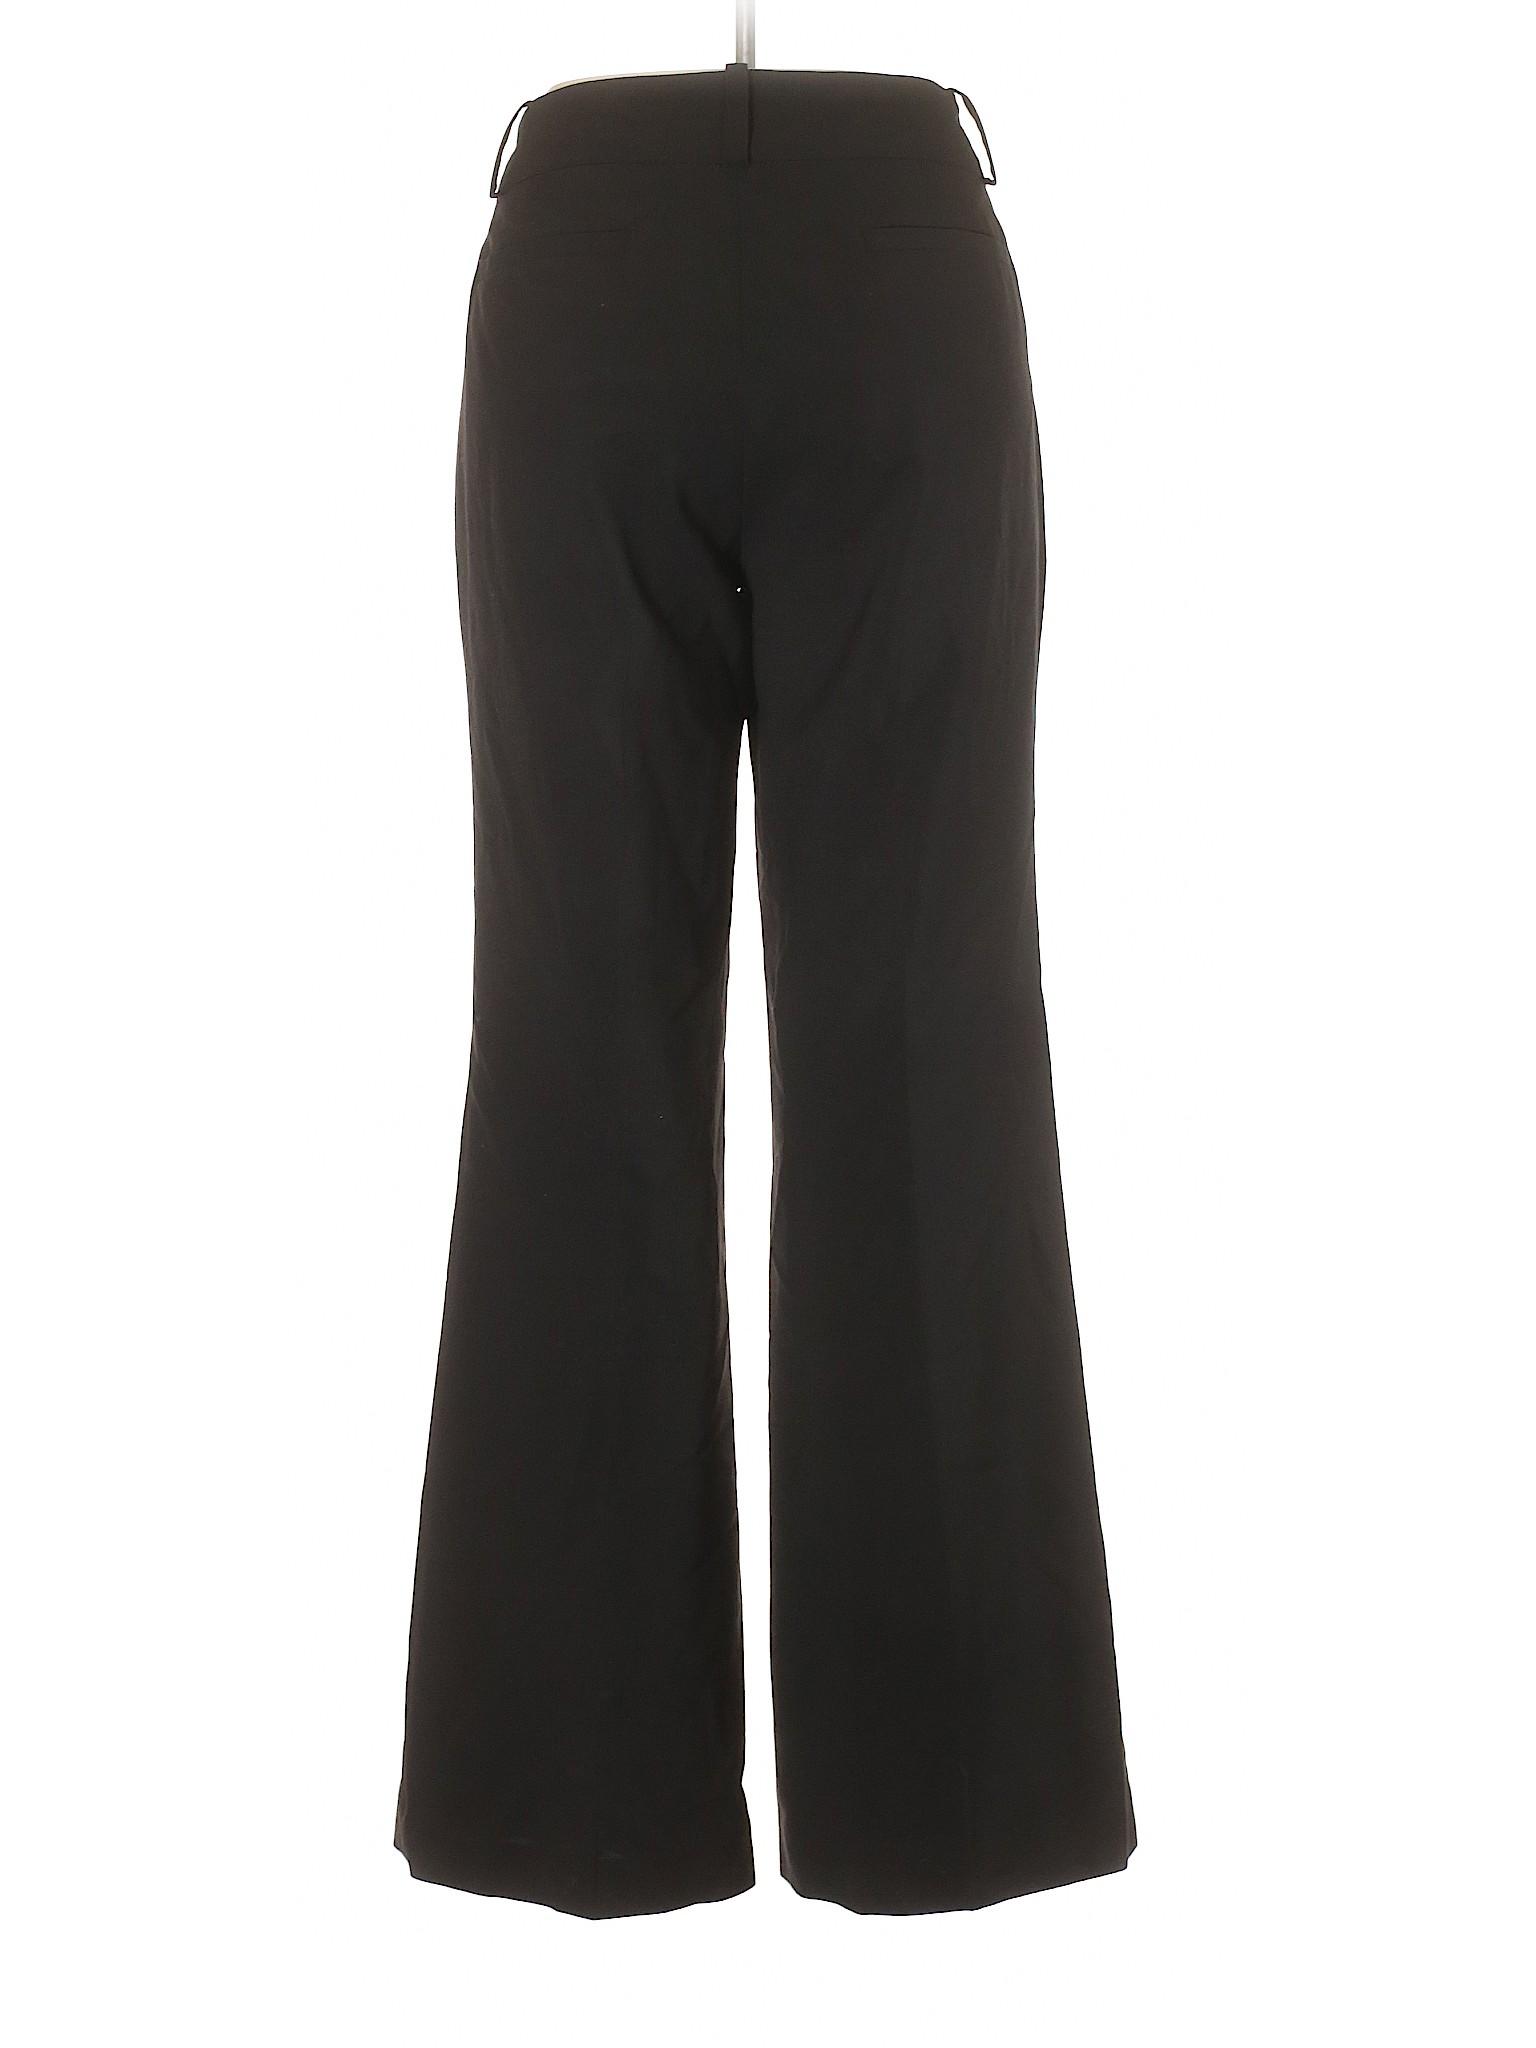 Wool Banana Boutique Republic Pants Winter qttR8